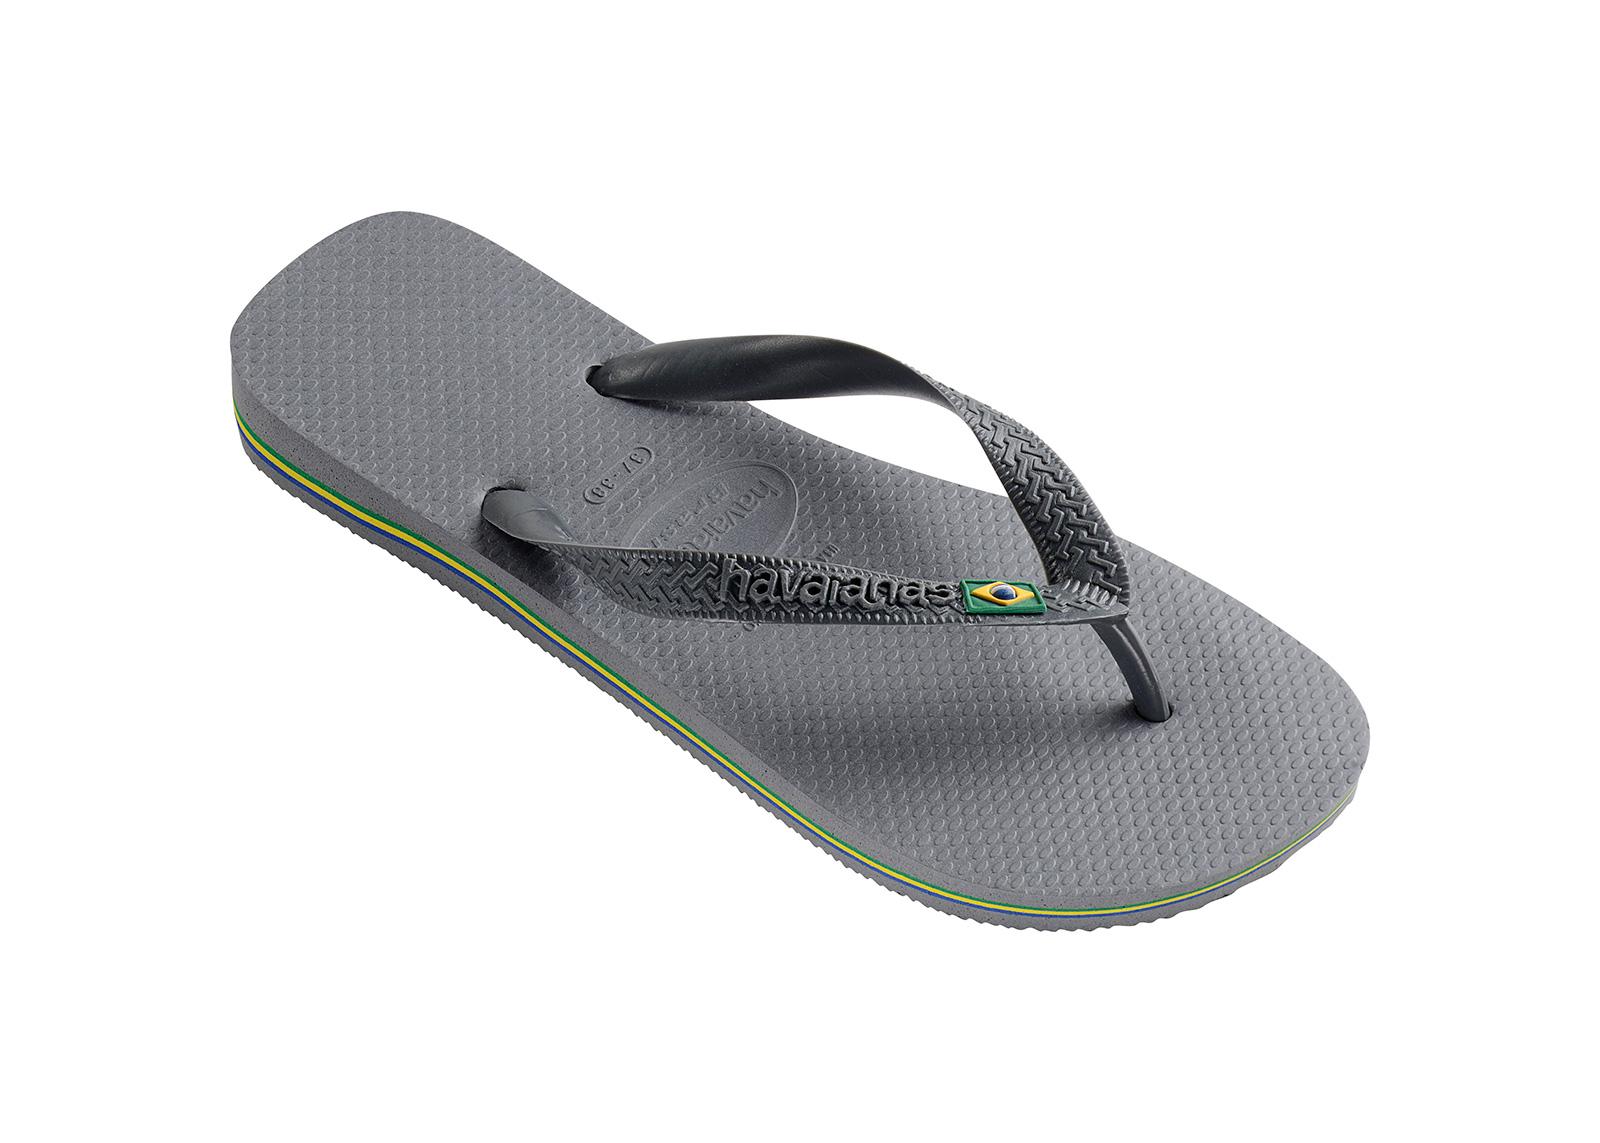 759f9d69f Flip-Flops Flip-flops - Havaianas Brasil Steel Grey - Brand Havaianas